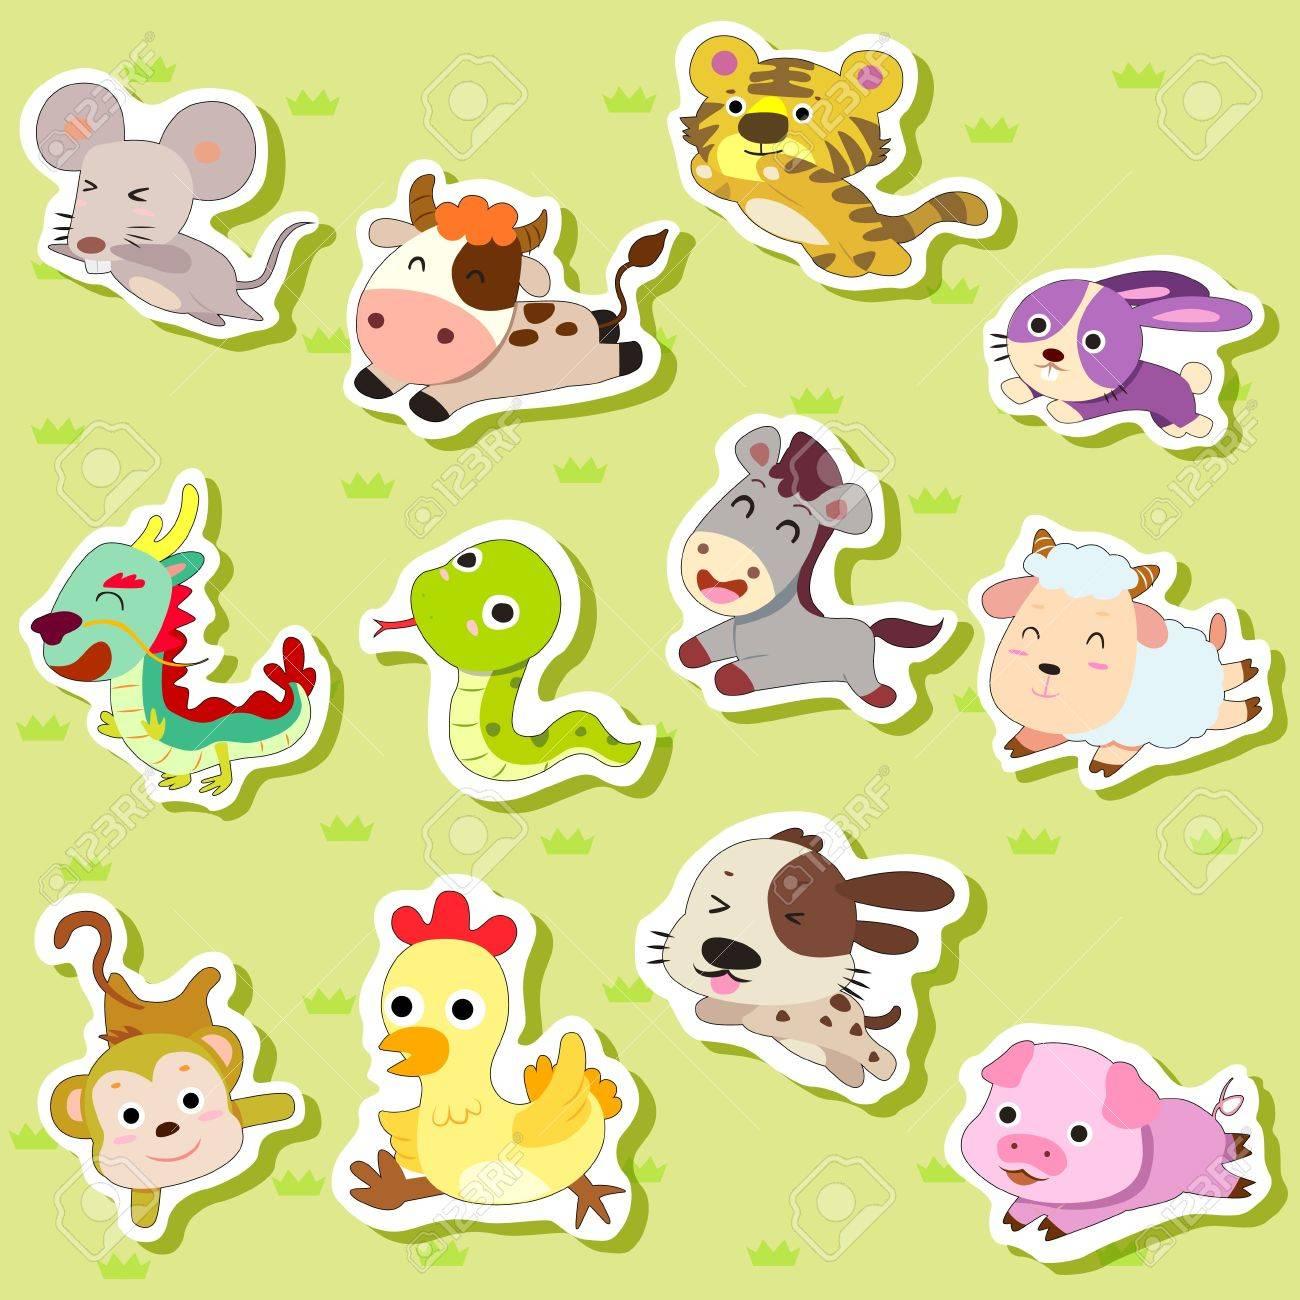 12 Chinese Zodiac animal stickers,cartoon vector illustration Stock Vector - 15834116